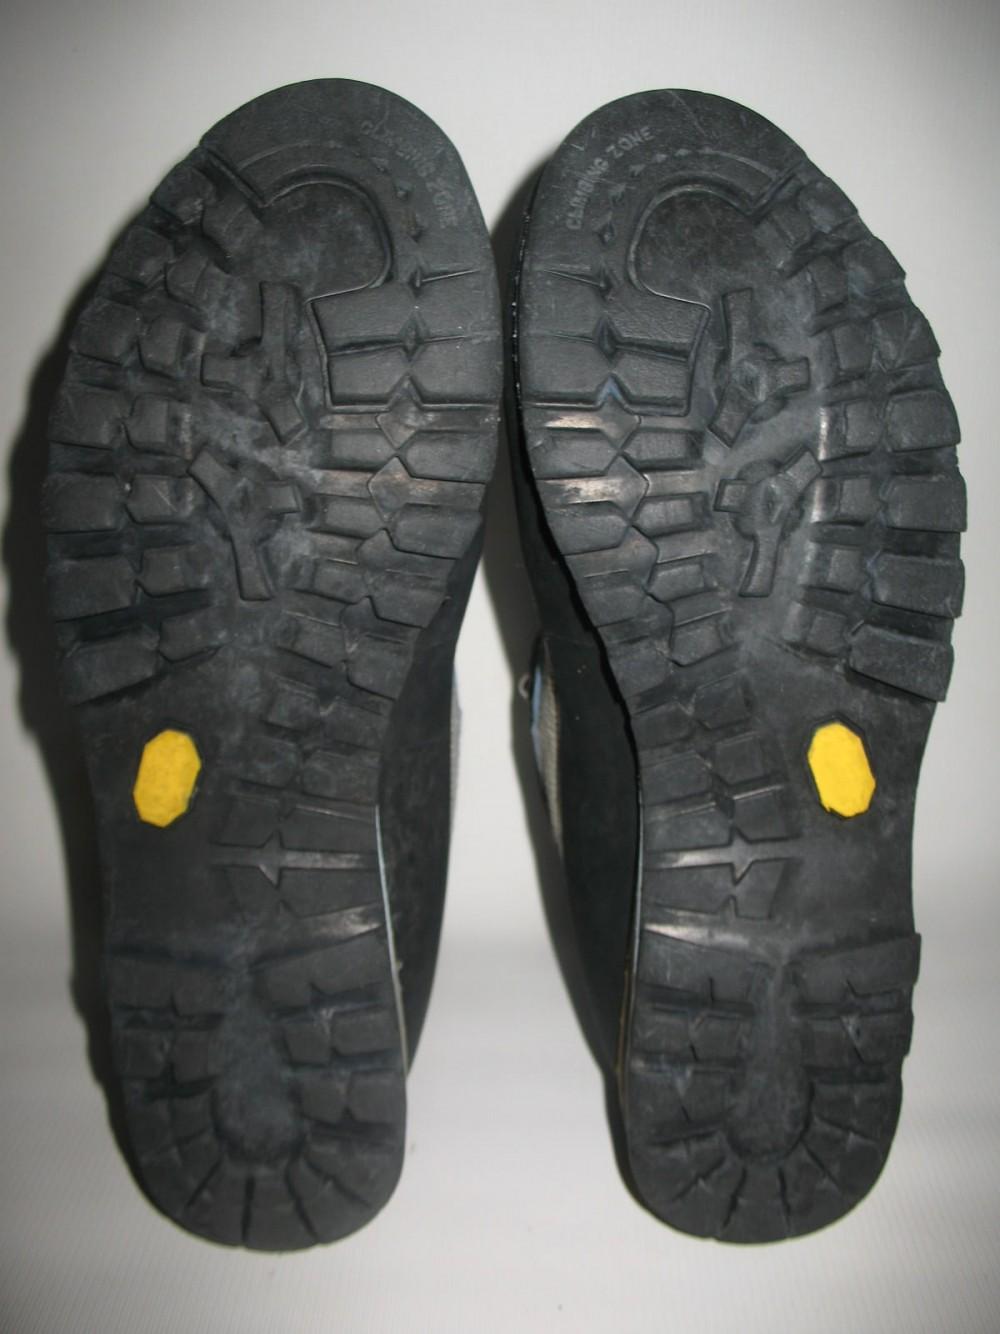 Ботинки LA SPORTIVA trango s evo boots lady (размер UK7.5/EU41(на стопу до 255 mm)) - 7